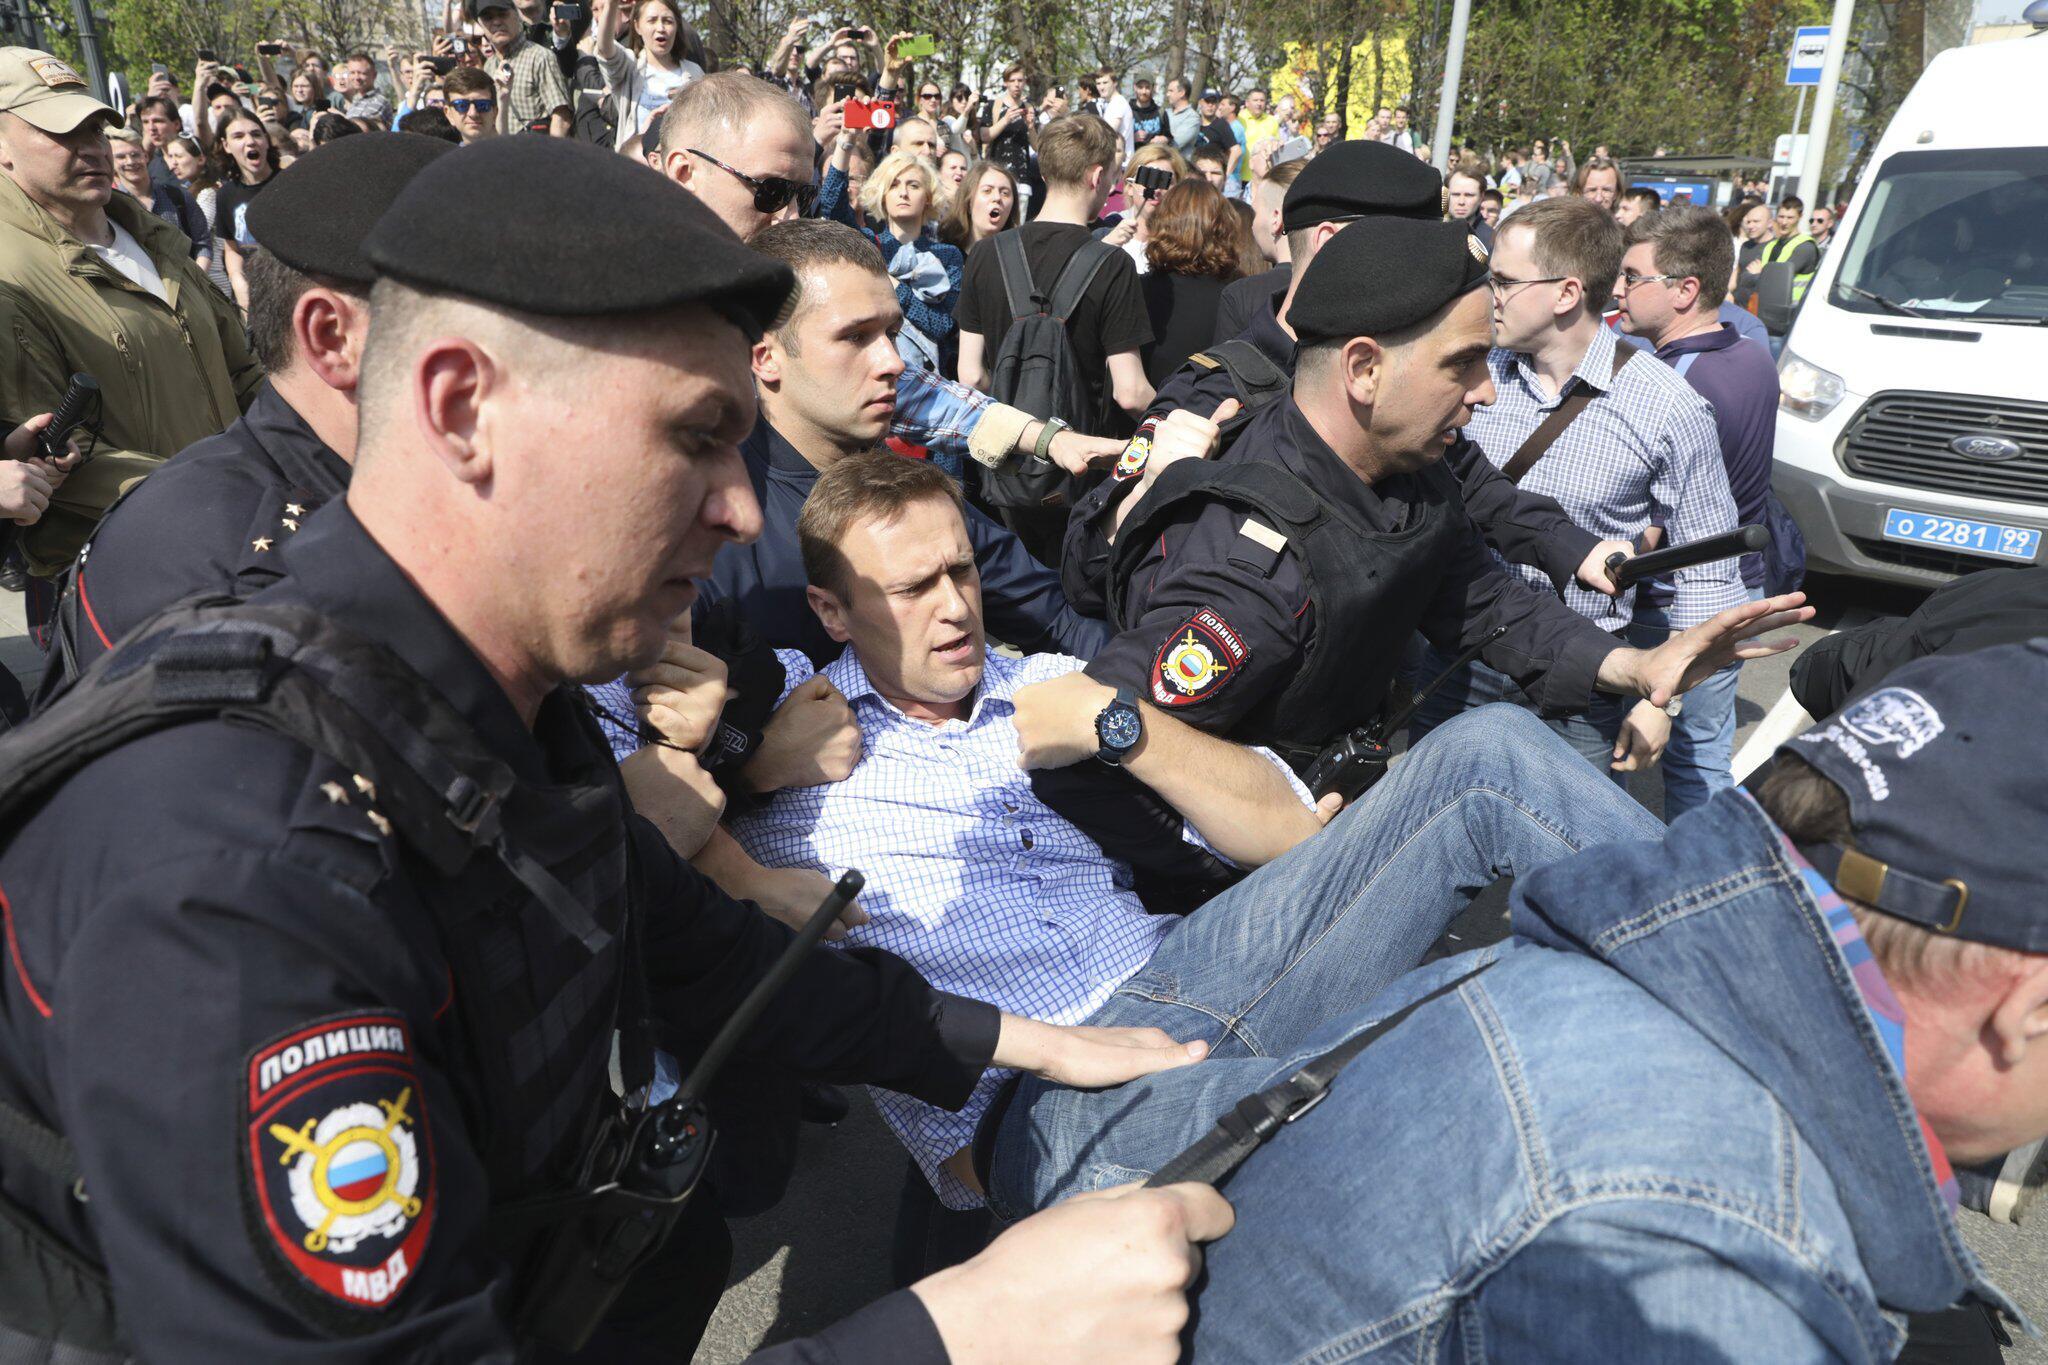 Bild zu Oppositionspolitiker Nawalny in Moskau festgenommen